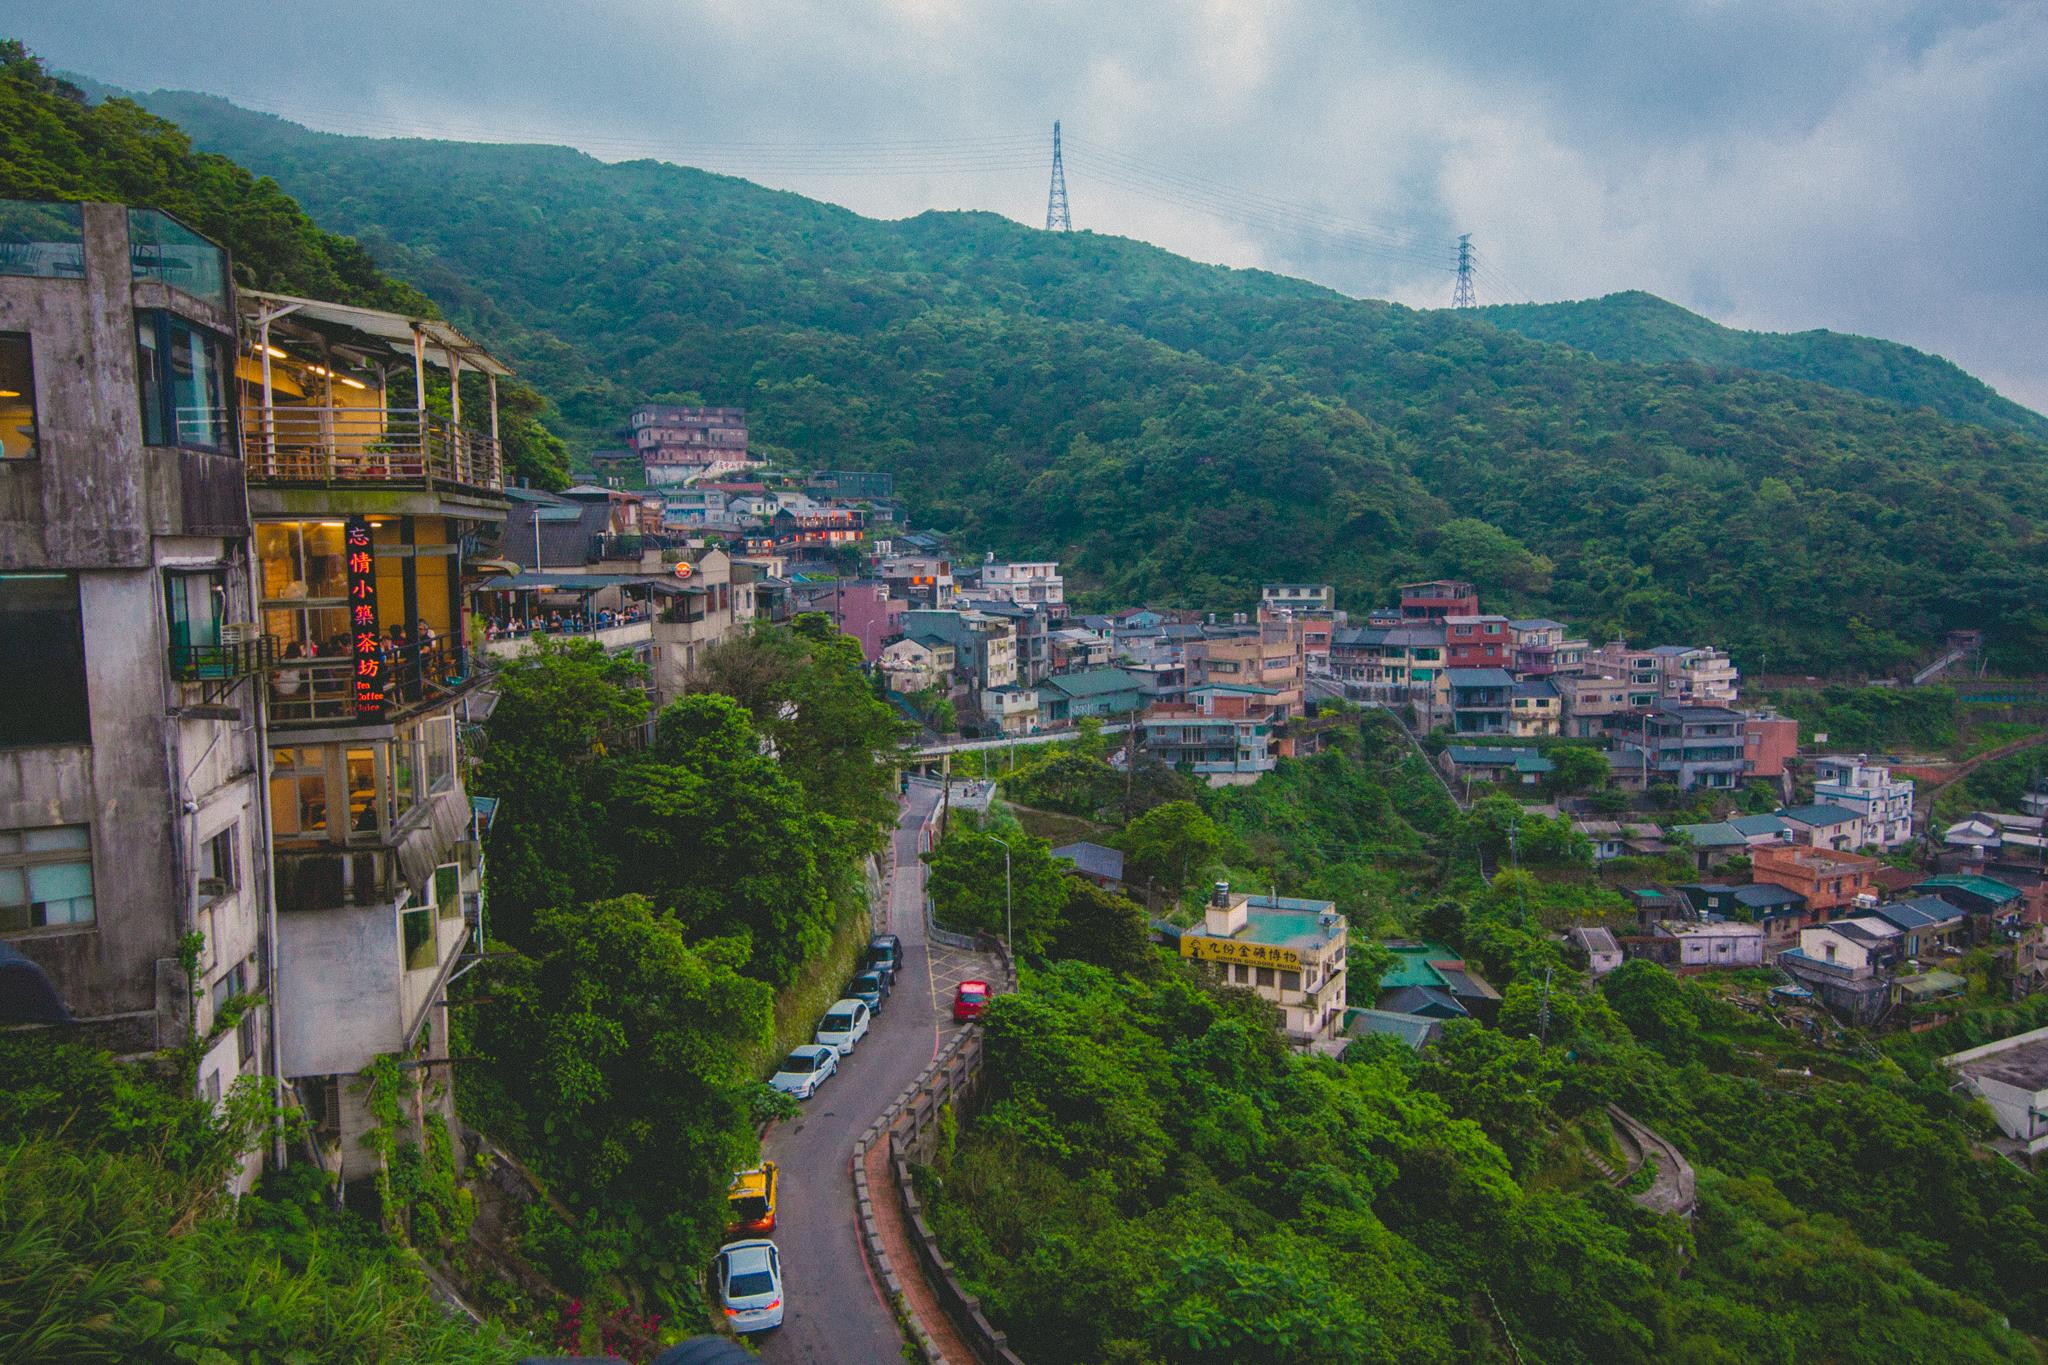 Town of Jiufen, Taiwan